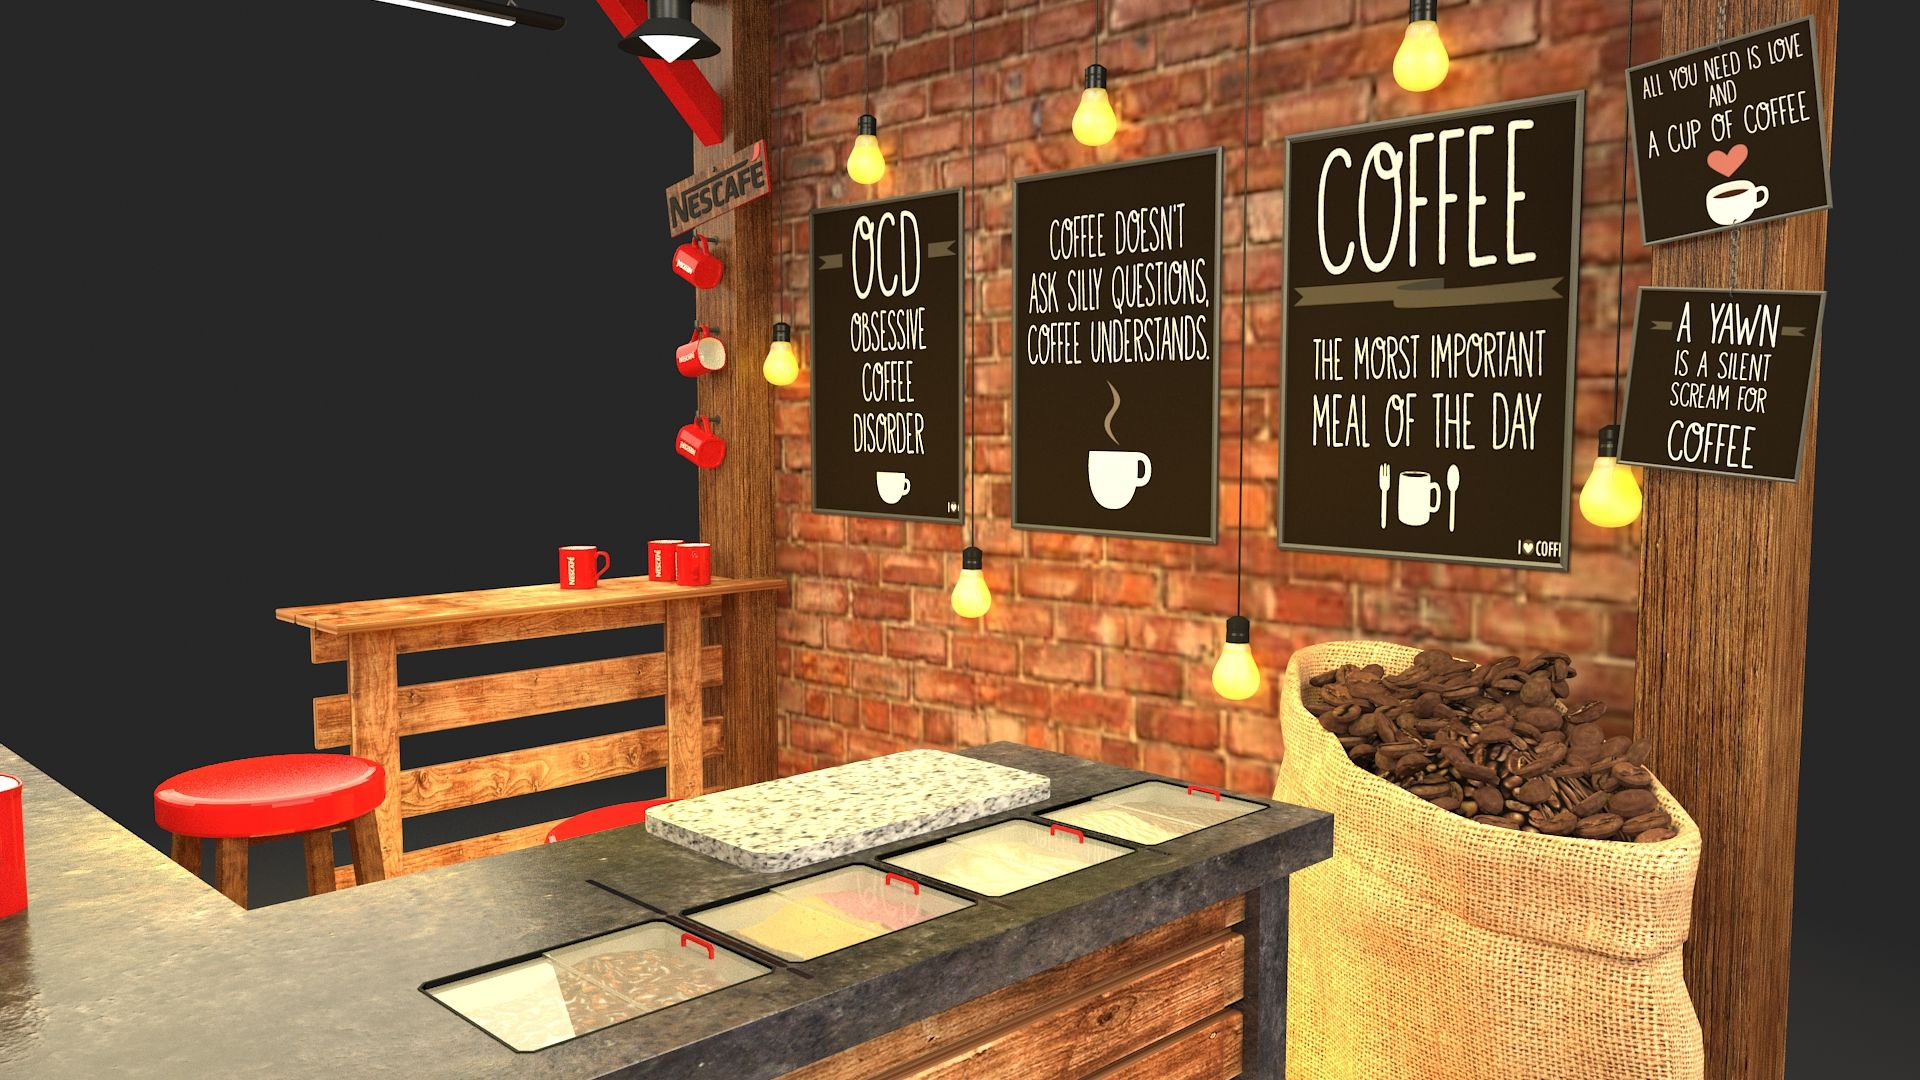 Nesacafe Coffee Booth Nescafe Coffee Nescafe Starting A Coffee Shop